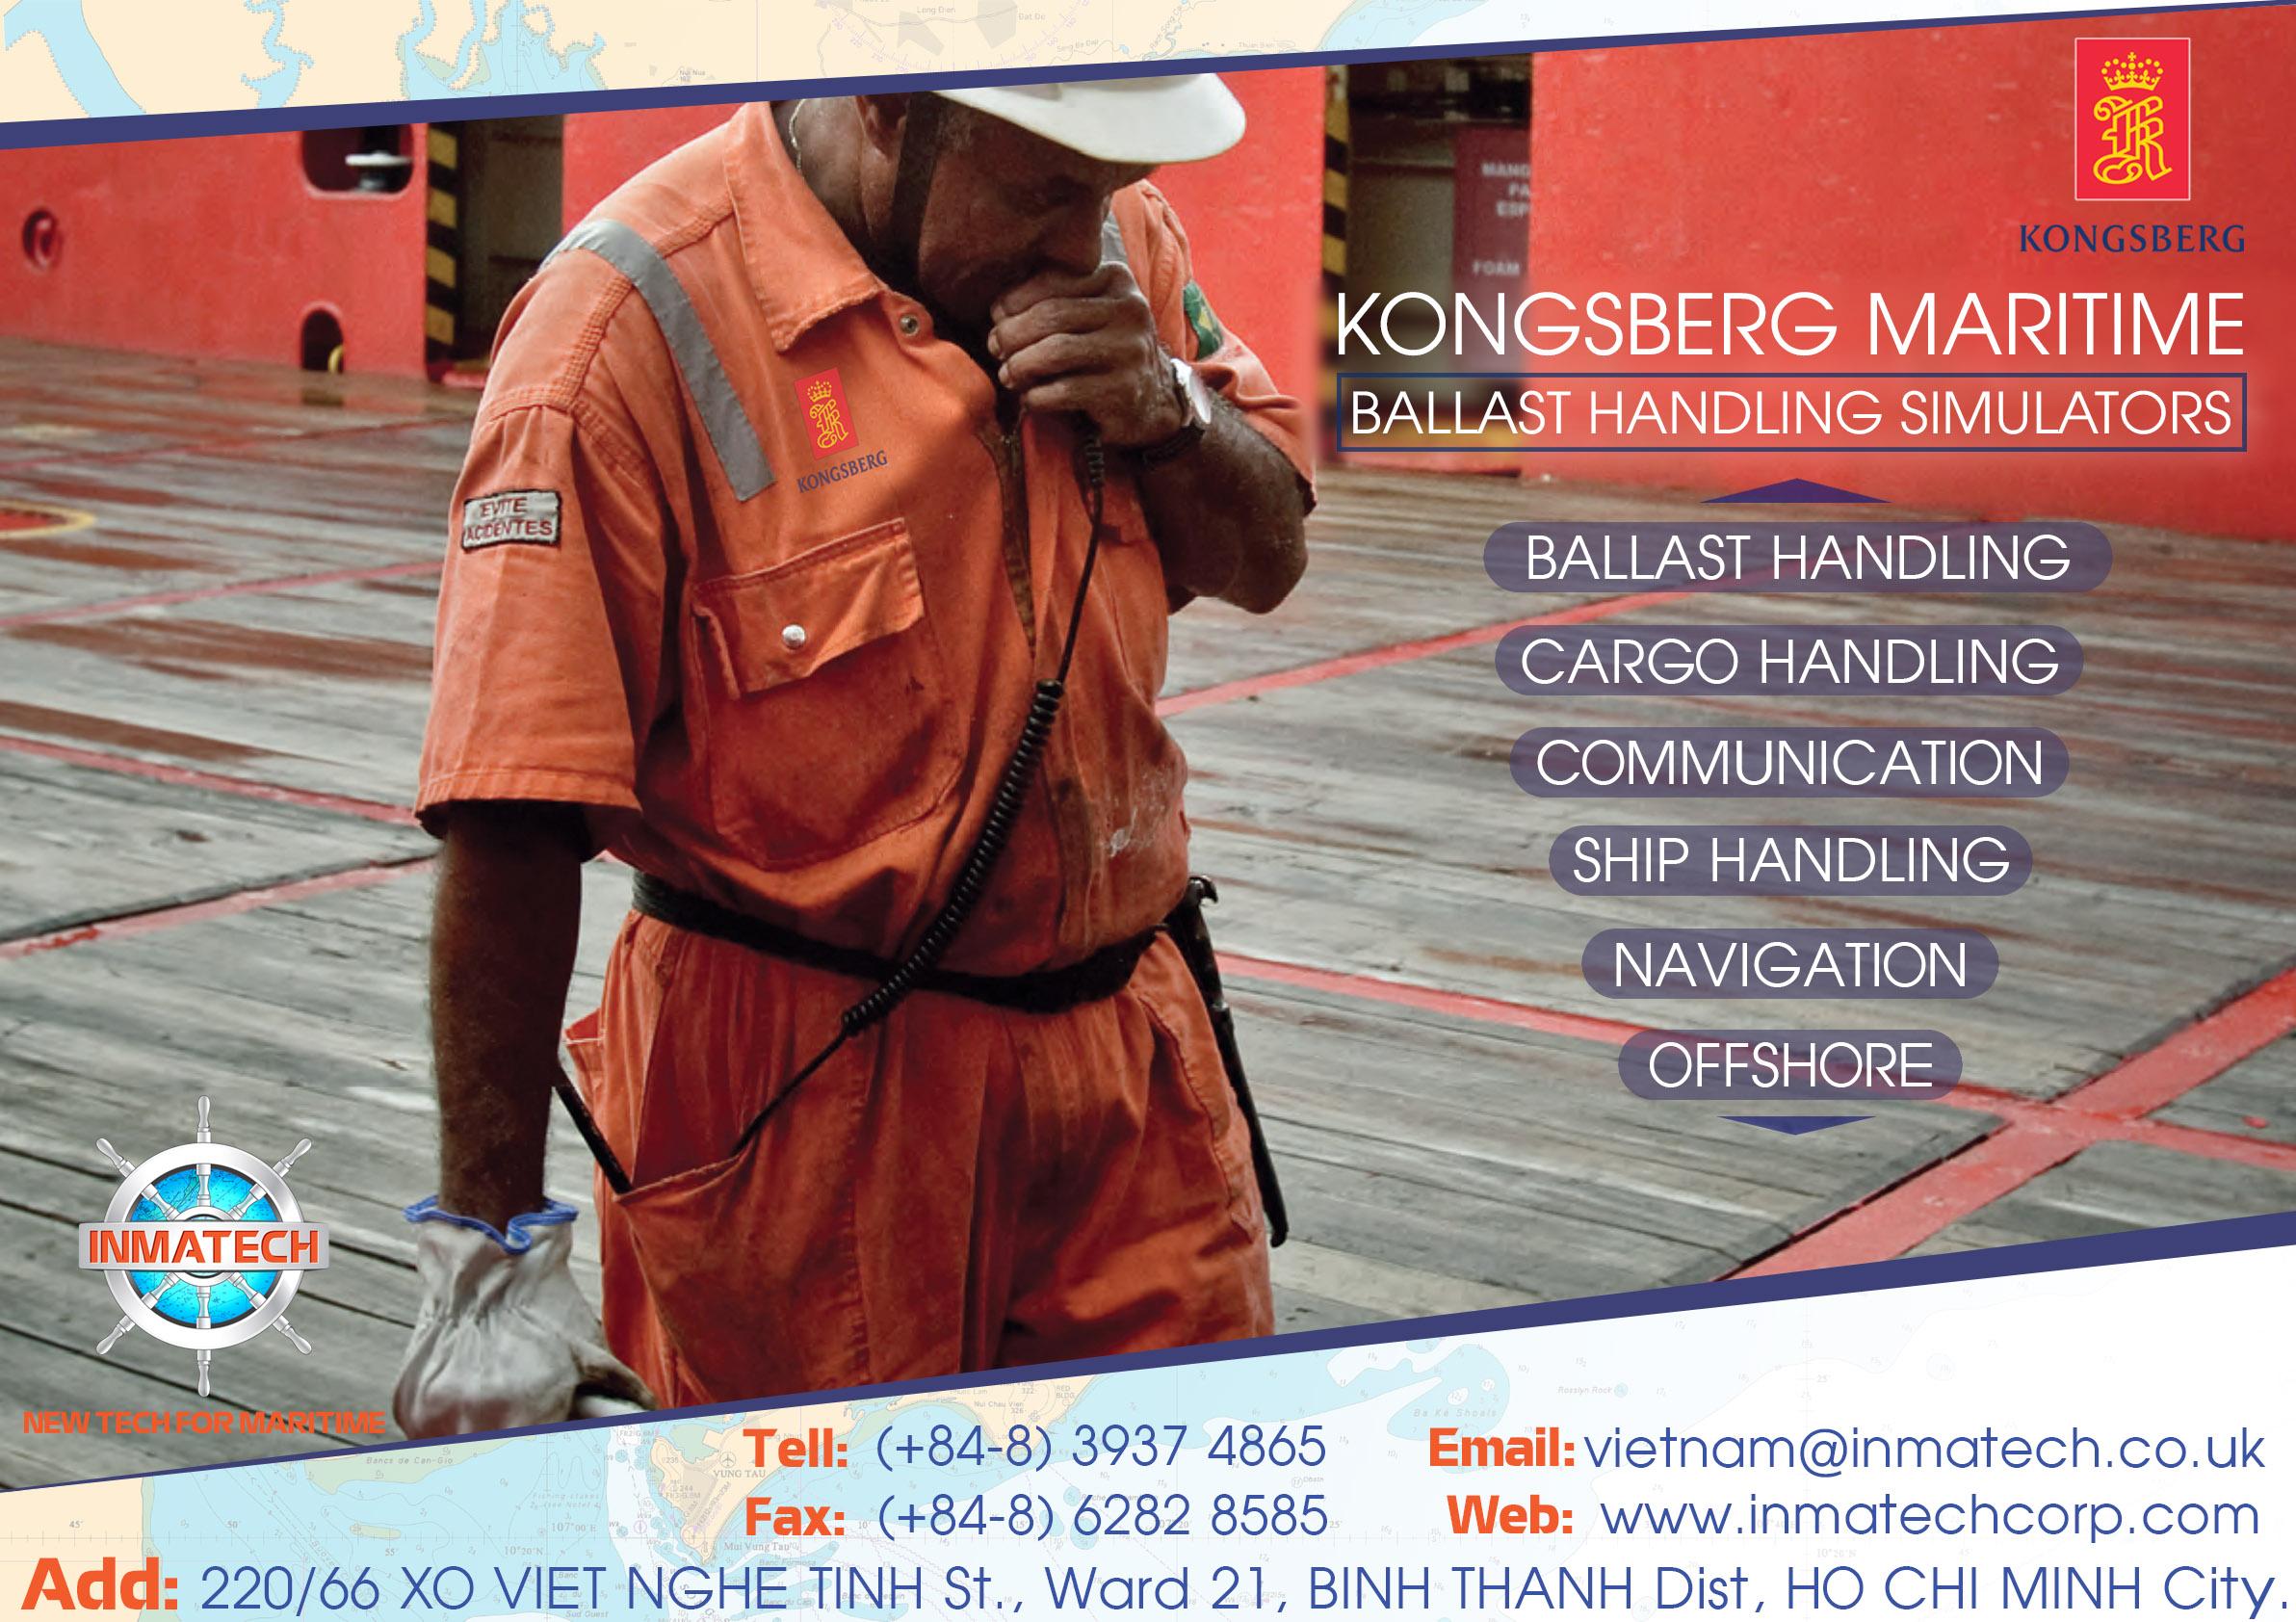 He thong mo phong Kongsberg